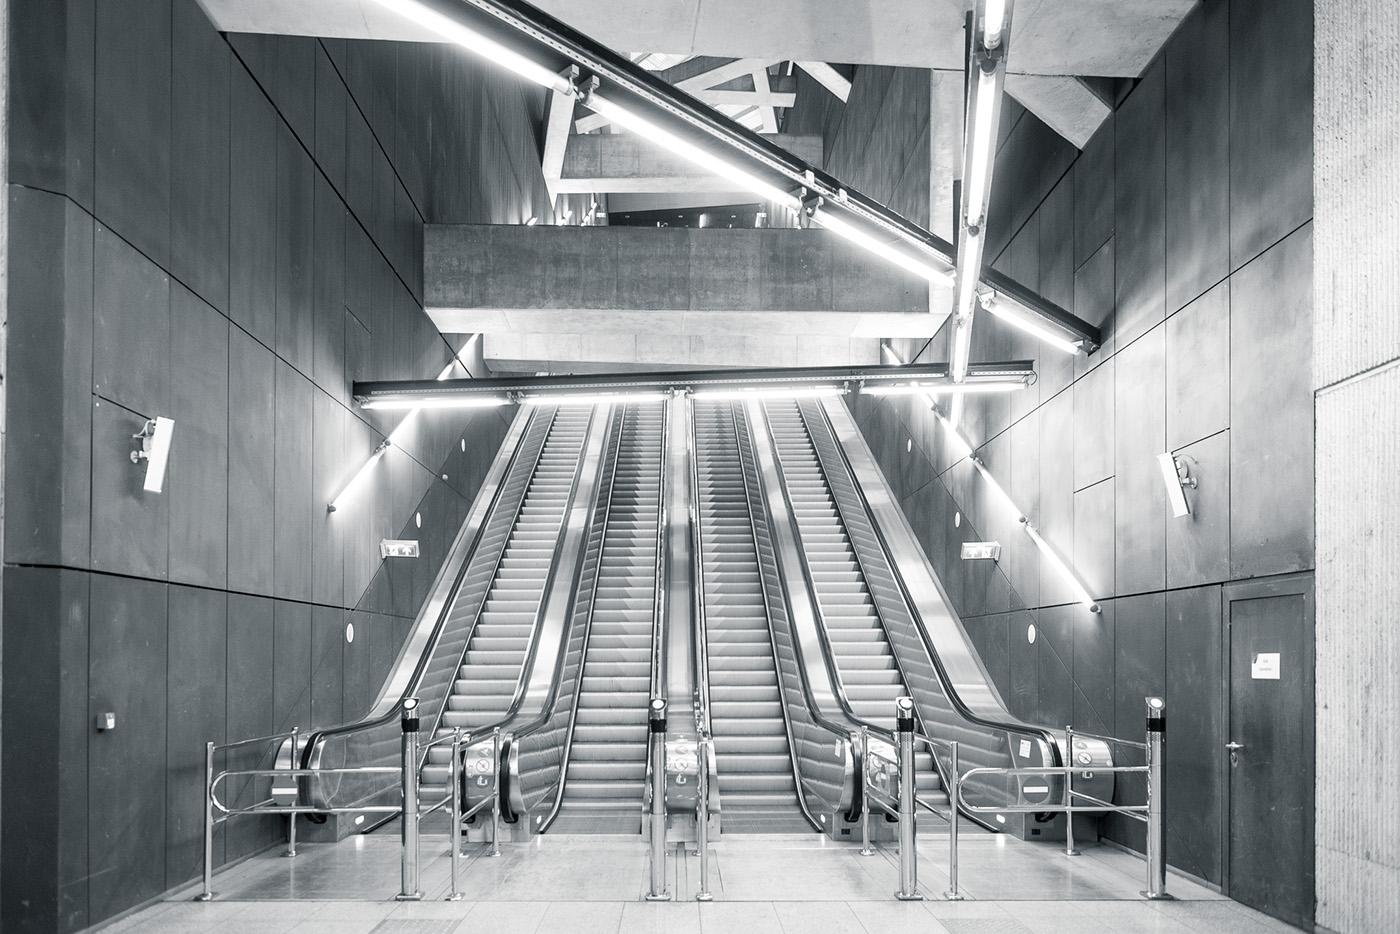 subway,underground,transportation,publictransportation,hungary,budapest,m4,metro,statue,NewCity